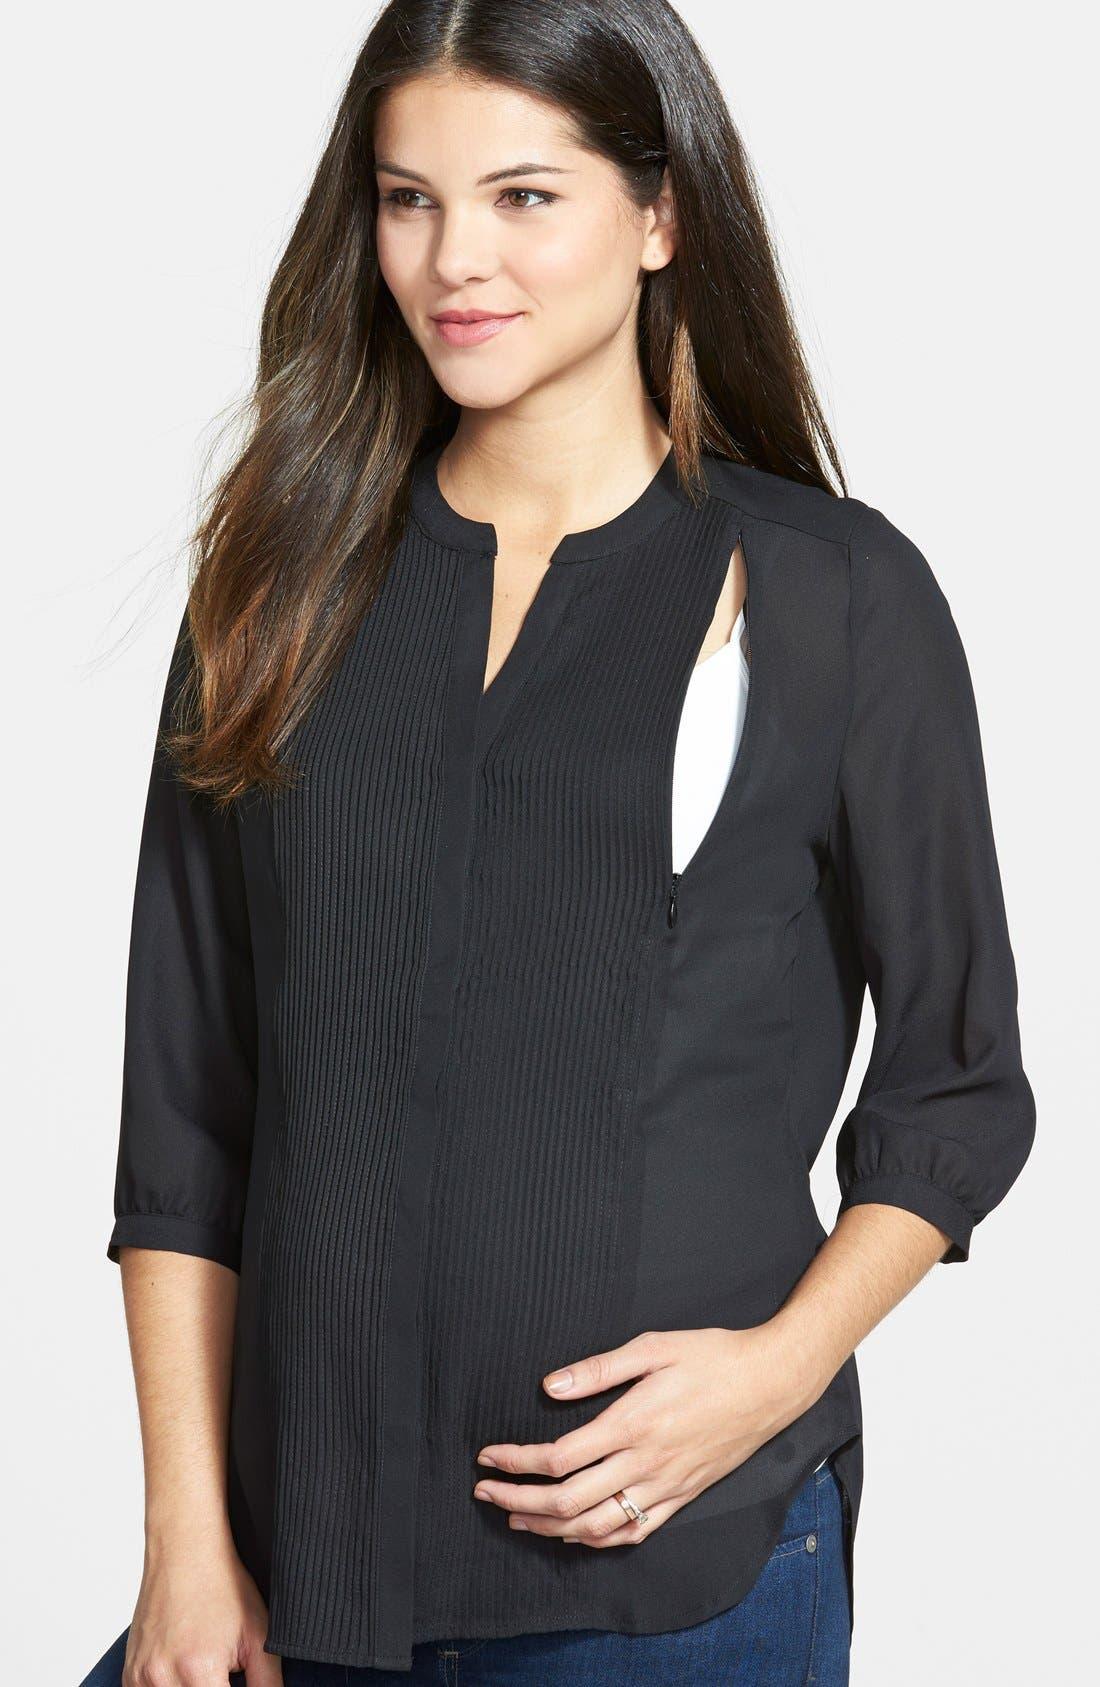 'Audrey' Maternity/Nursing Tuxedo Blouse,                             Alternate thumbnail 5, color,                             BLACK